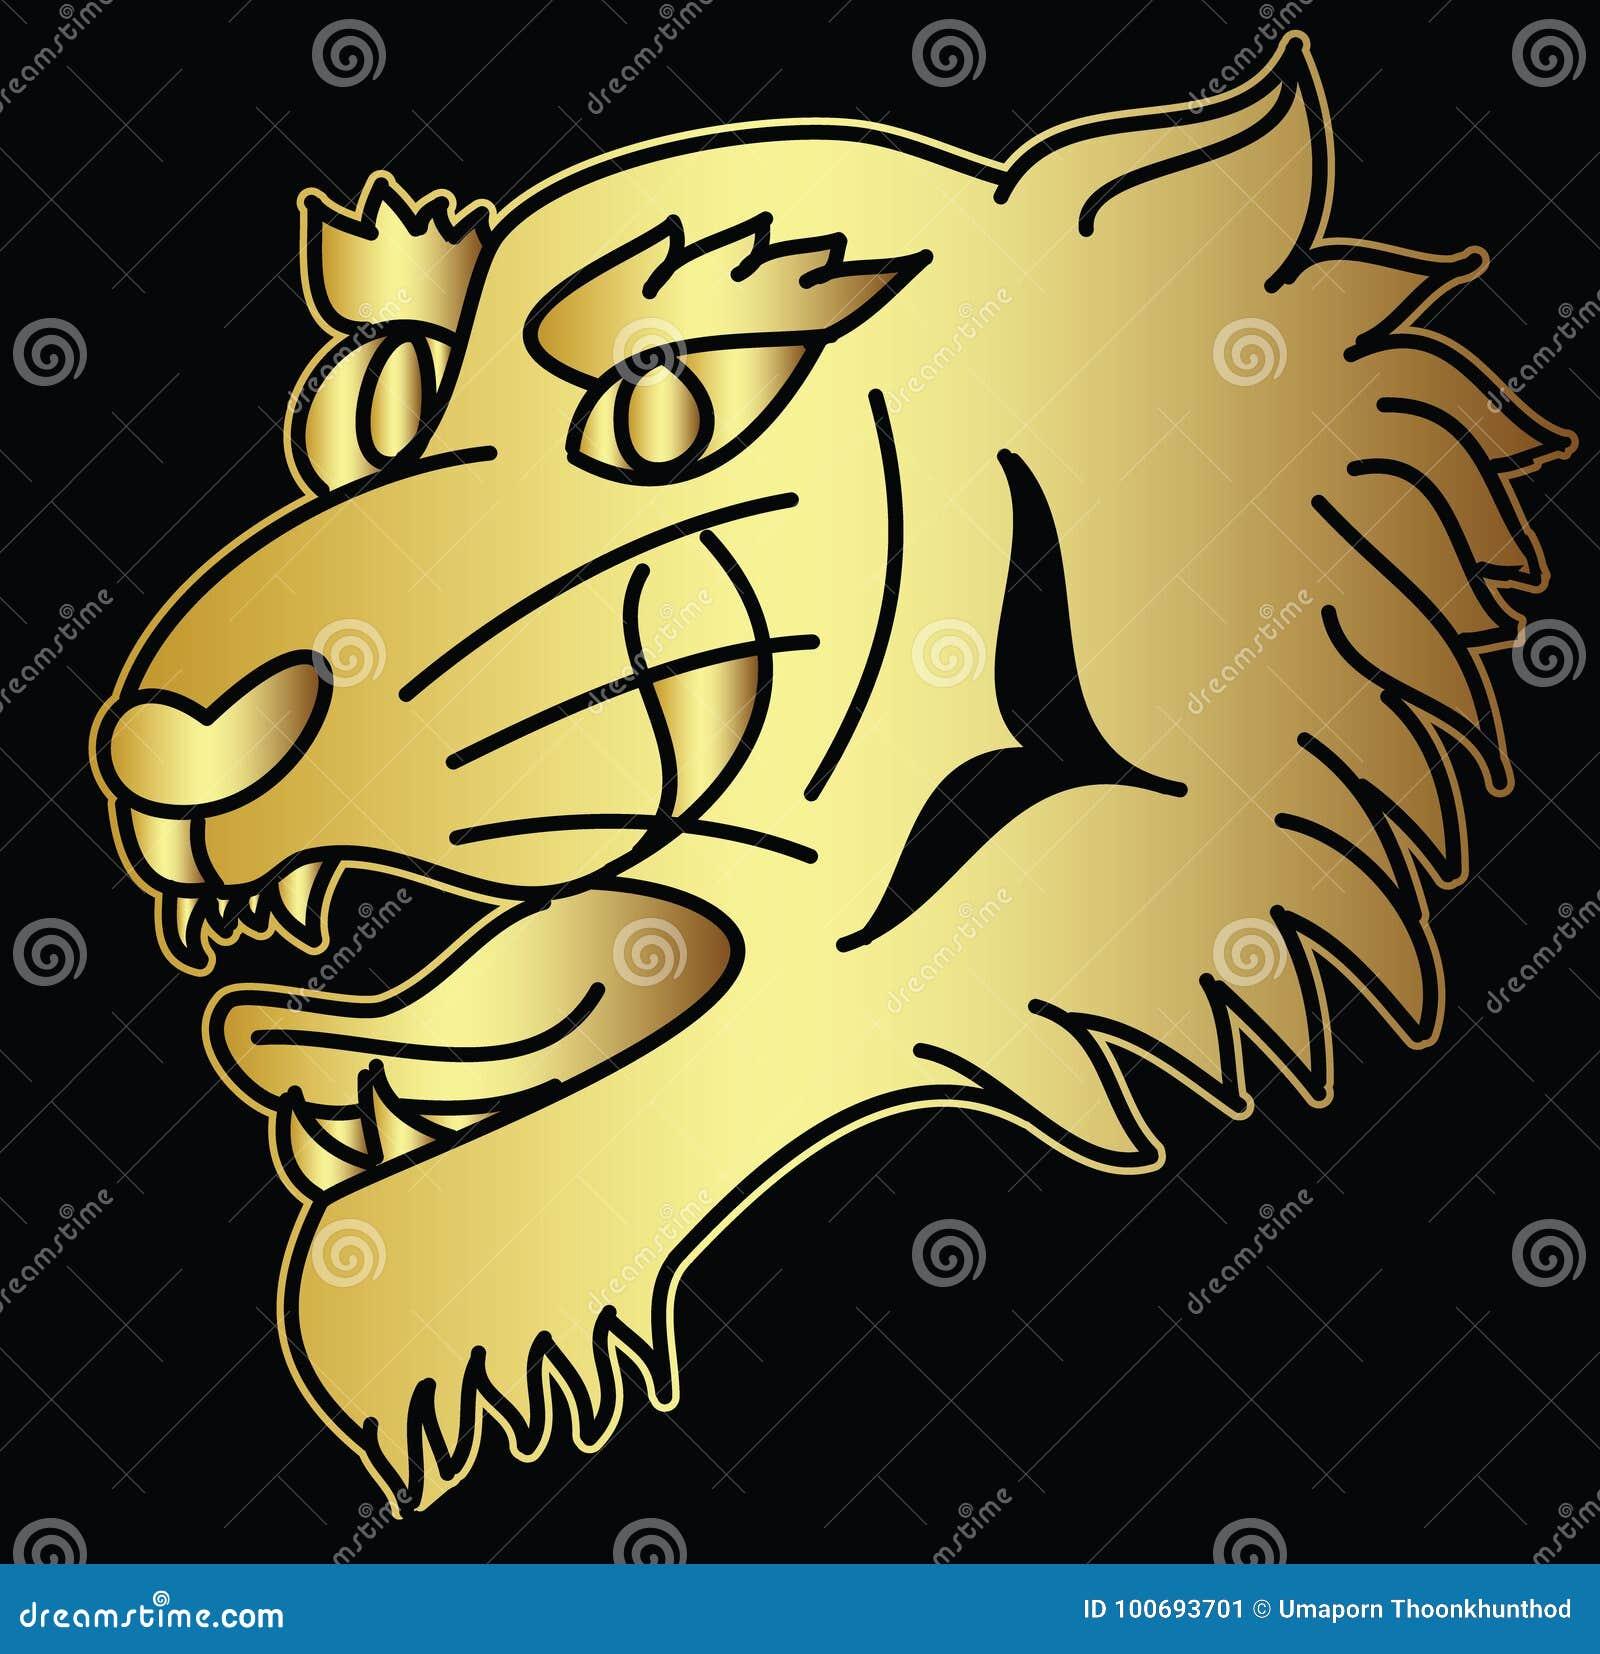 Golden Japanese Tiger Head Tattoo Design Vector For Sticker Stock Vector Illustration Of Black Golden 100693701